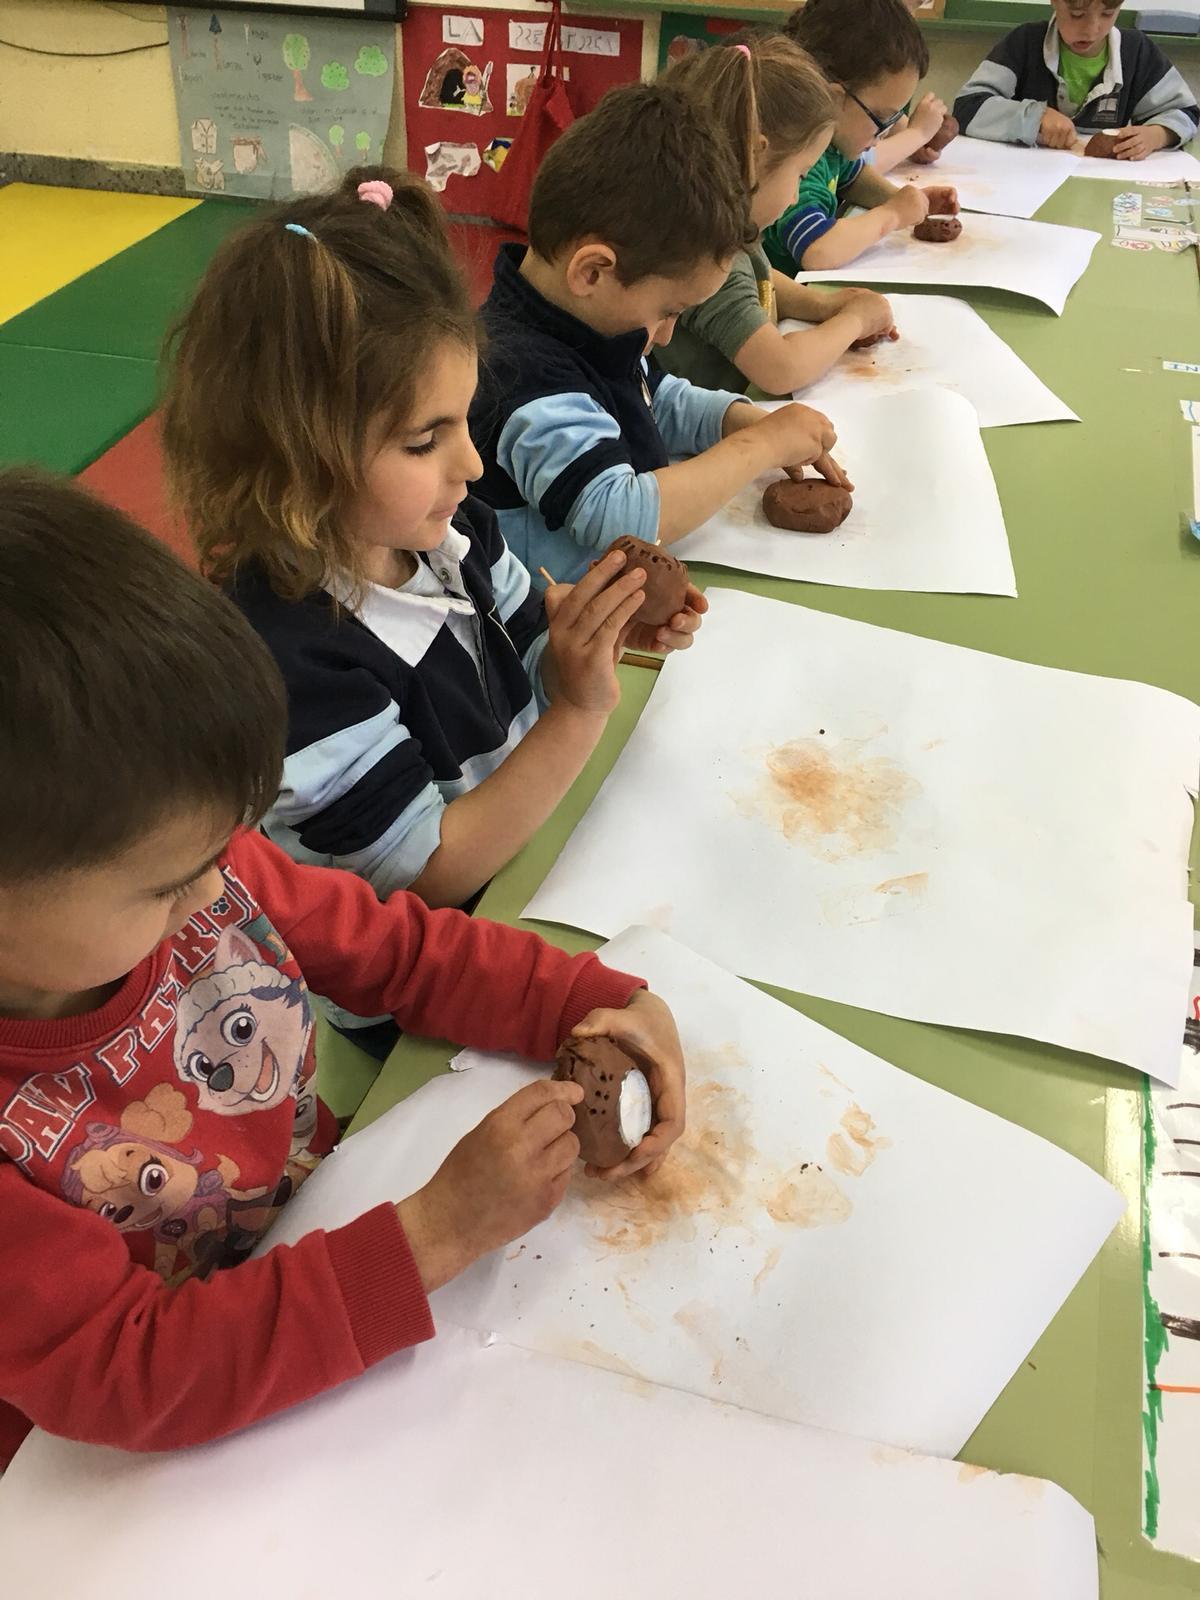 2019_03_15_Infantil 4B descubre la pintura rupestre_CEIP FDLR_Las Rozas 5